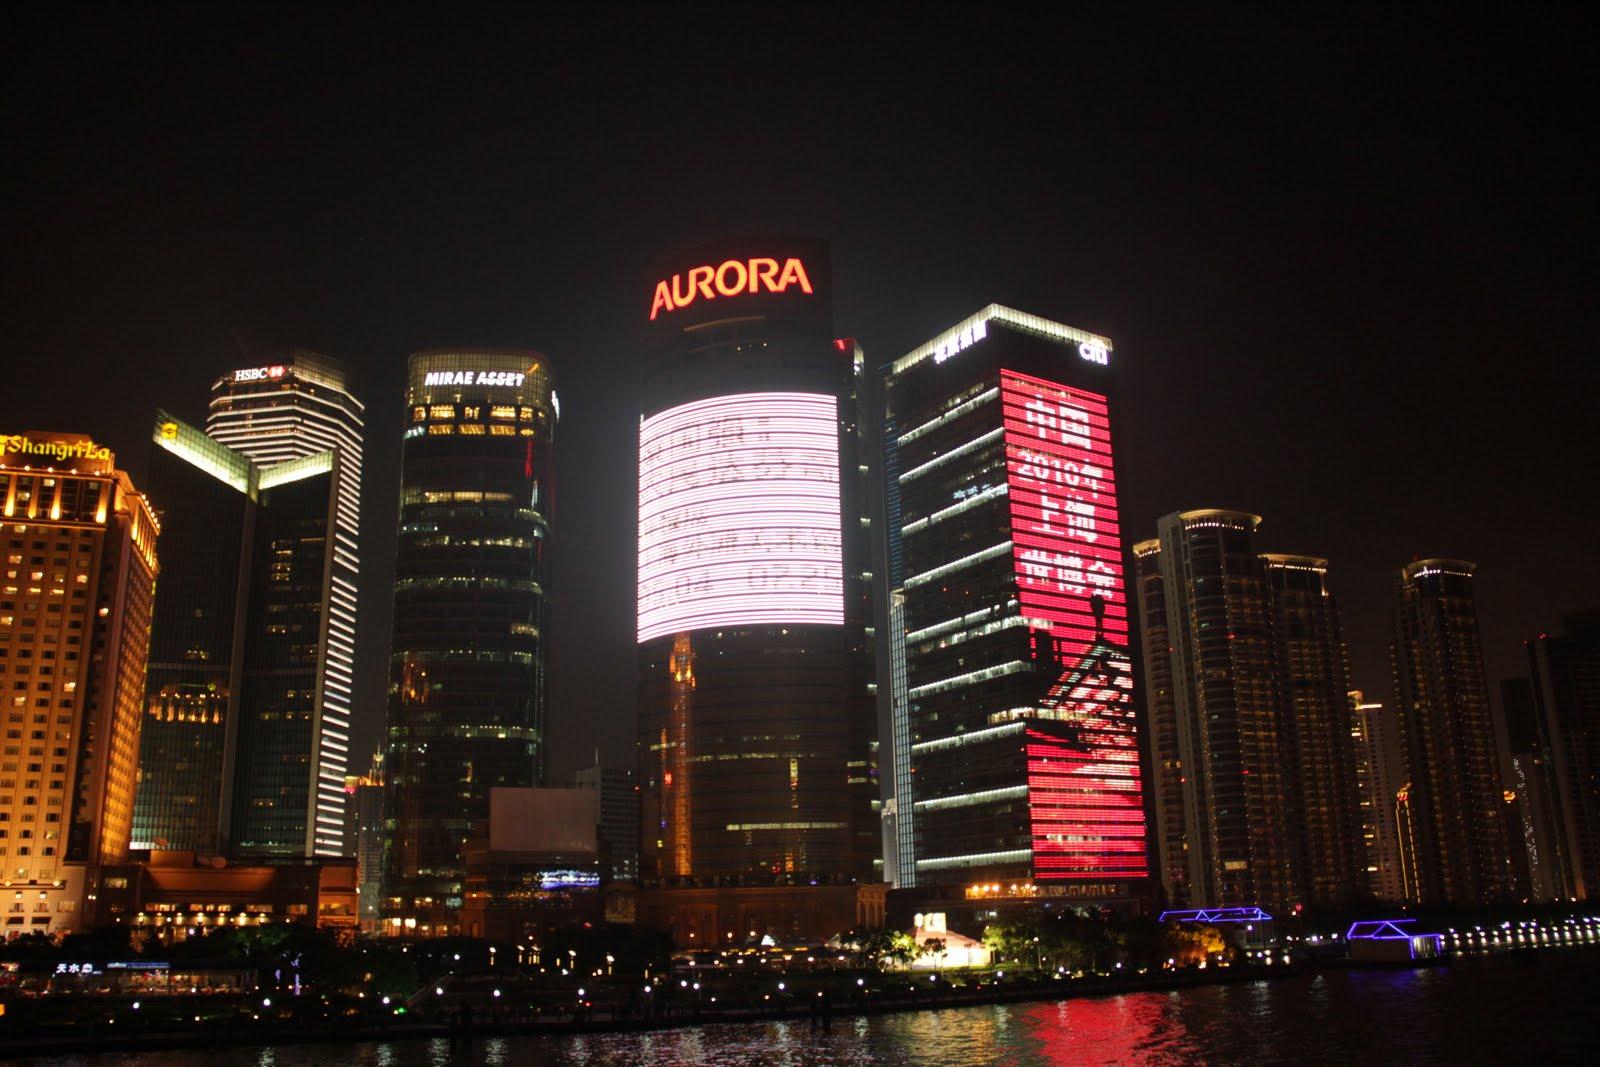 http://1.bp.blogspot.com/_NwaOMeUjCkE/TCNooBkHybI/AAAAAAAABl4/80lRScfVxbA/s1600/2June2010+Shanghai+SLR+547.JPG